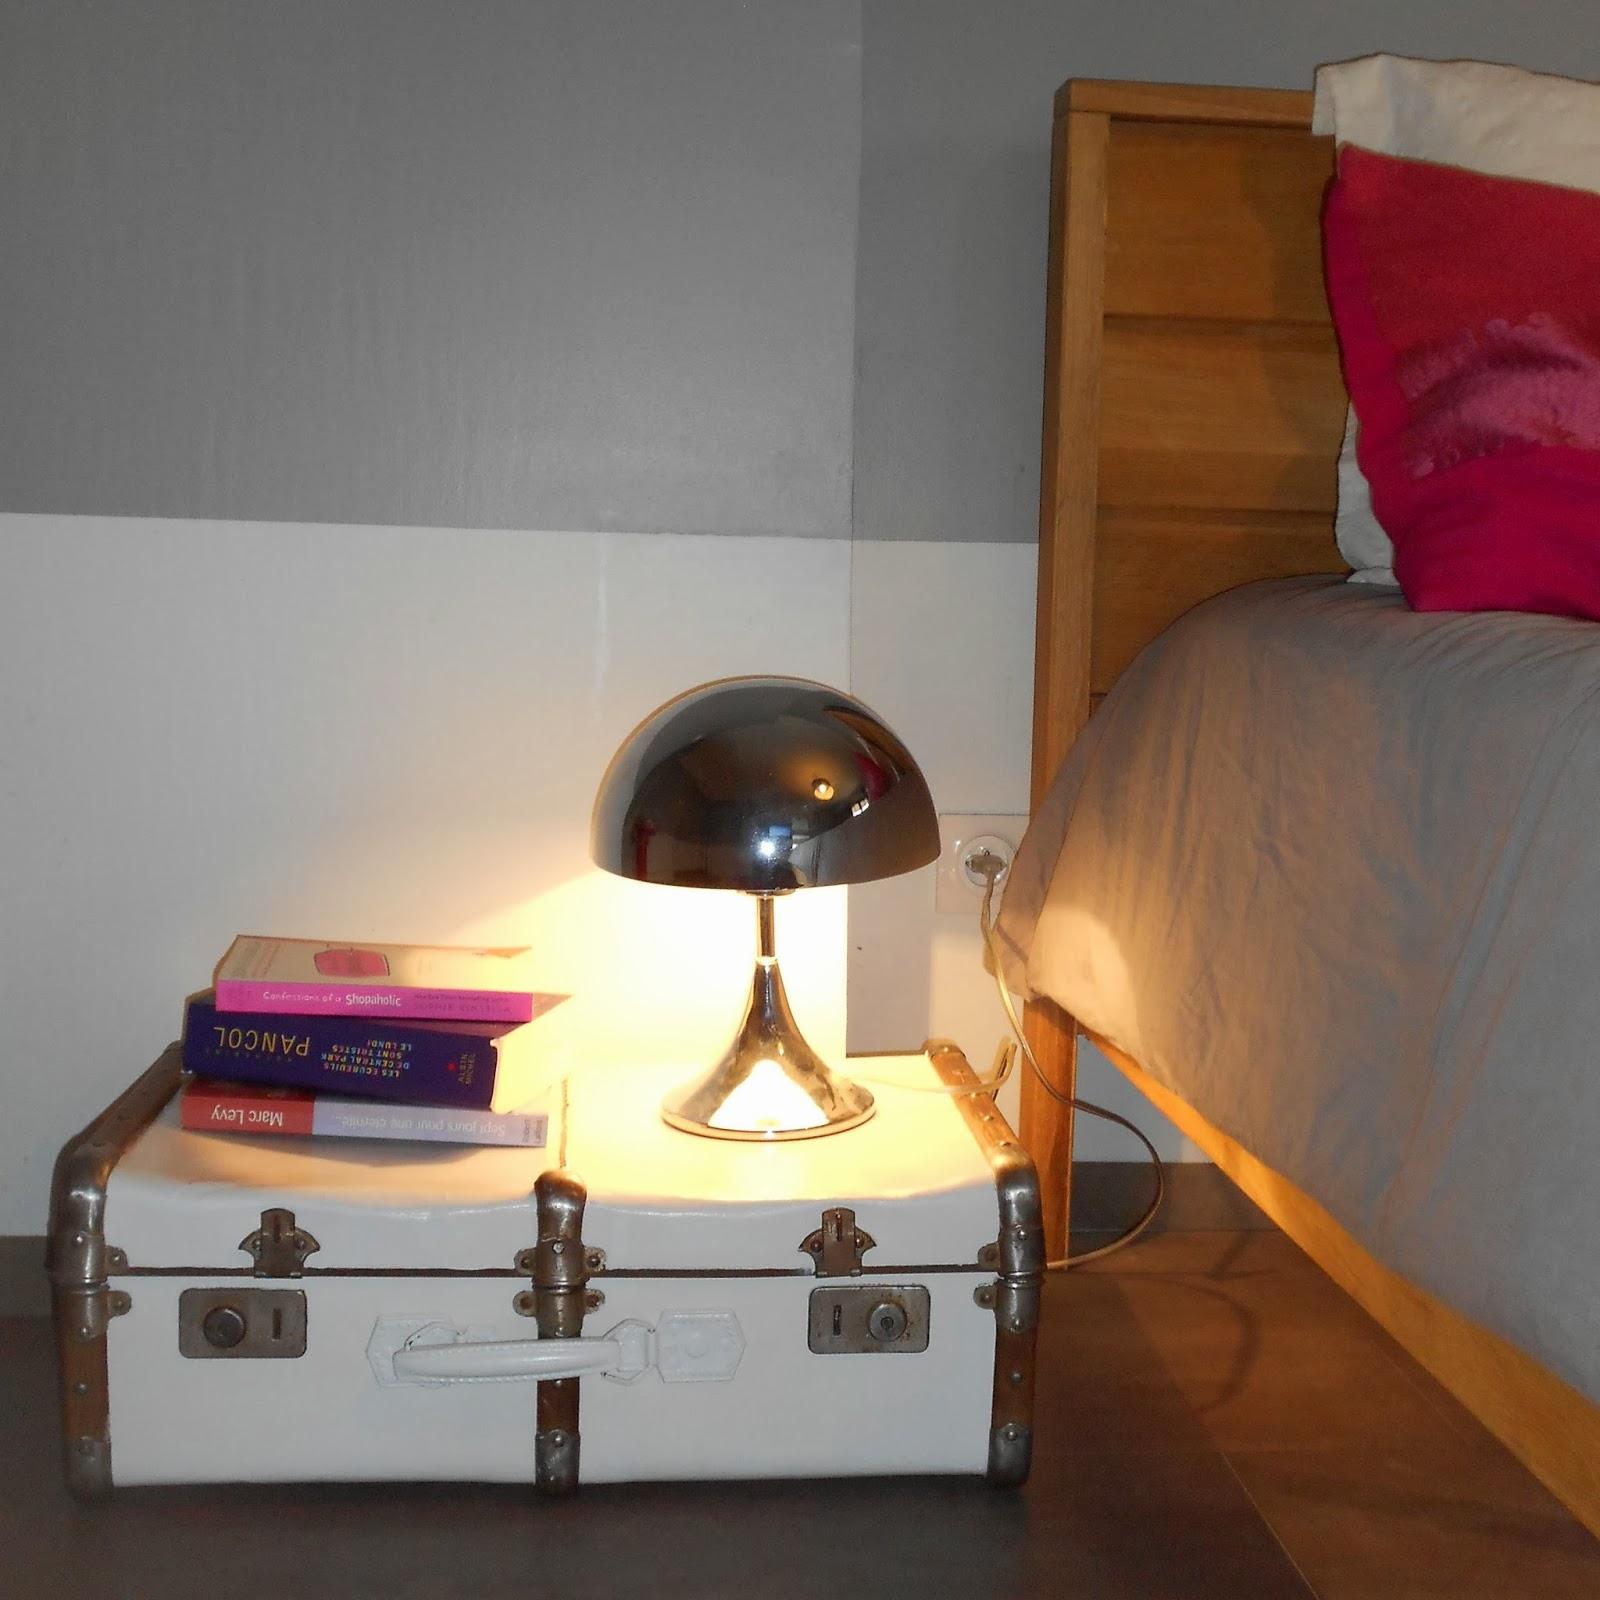 au coeur des choses decoration. Black Bedroom Furniture Sets. Home Design Ideas